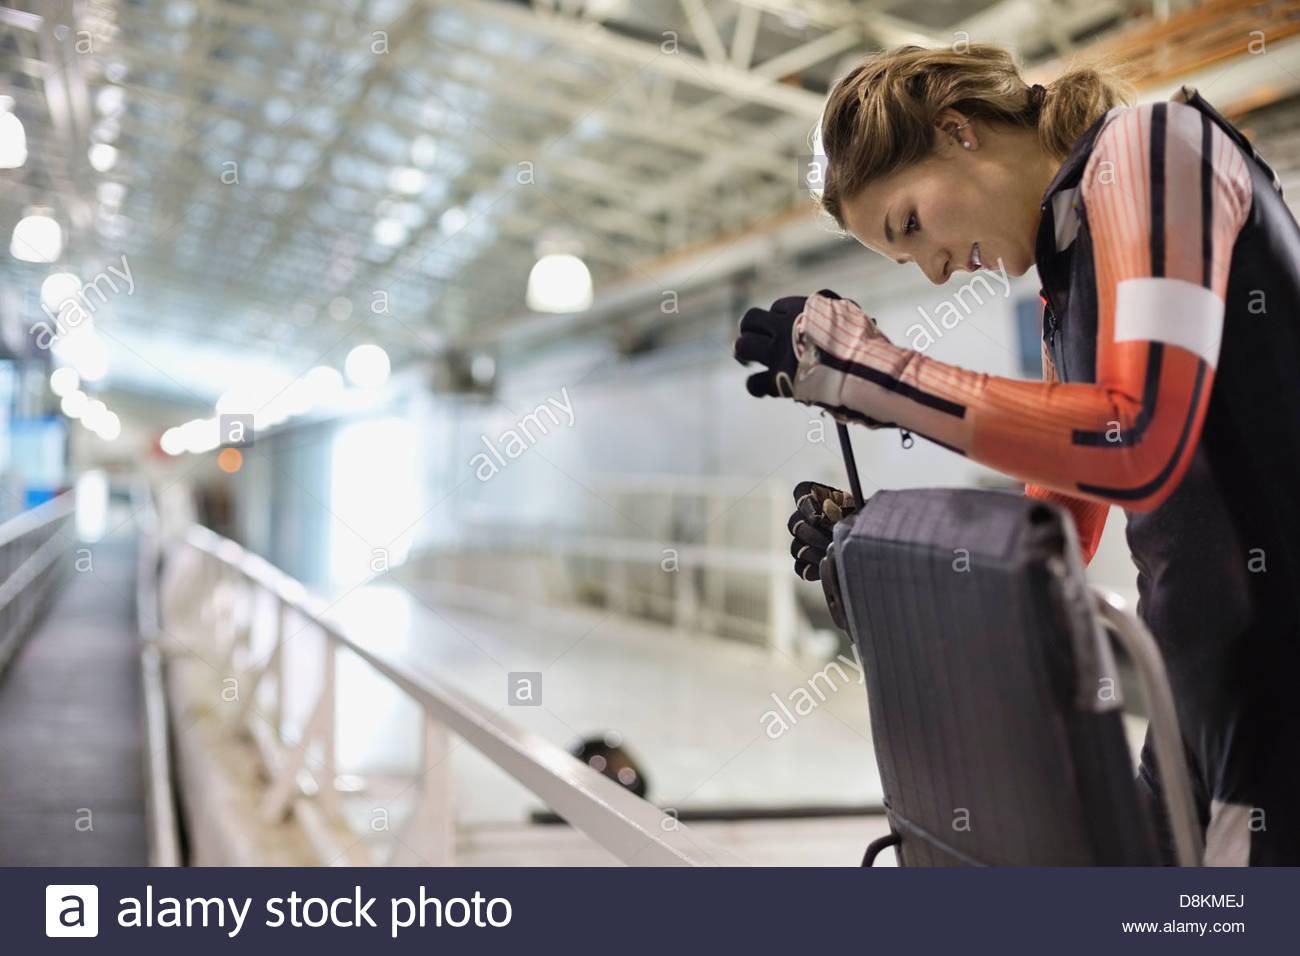 Female skeleton athlete repairing sled on track Stock Photo